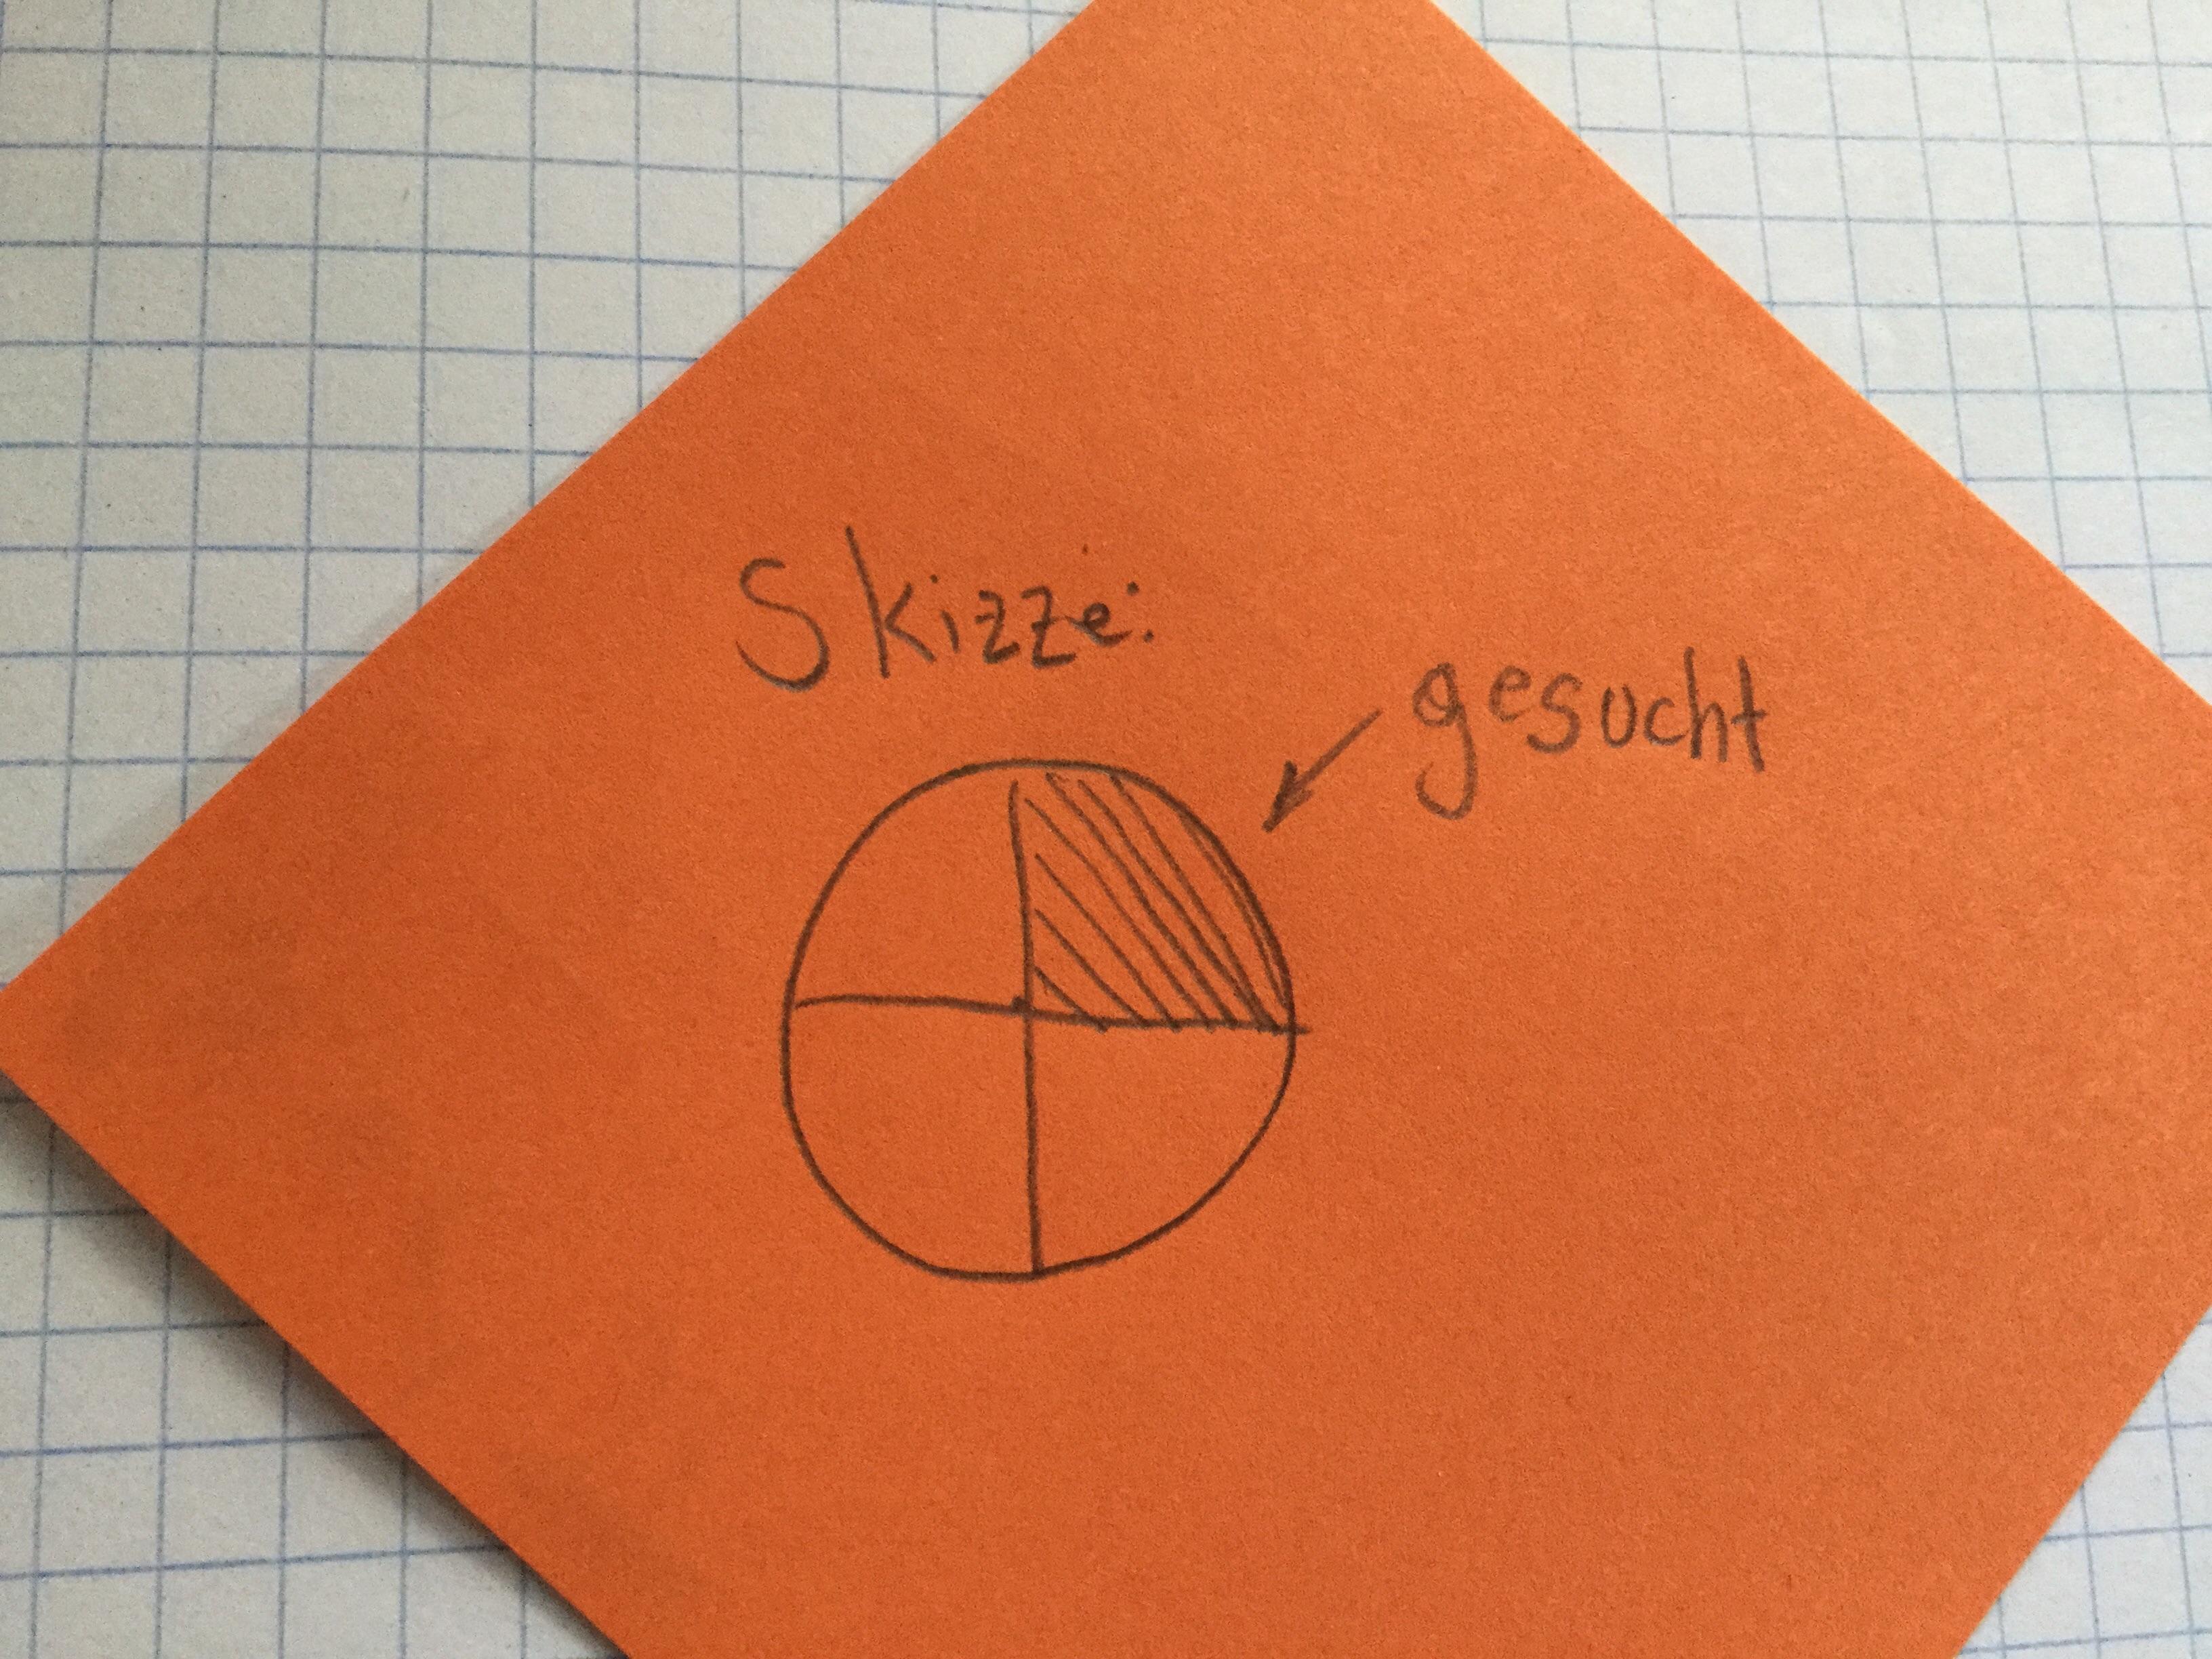 Wie Rechnet Man Das Beim Kreis Aus? (Mathe